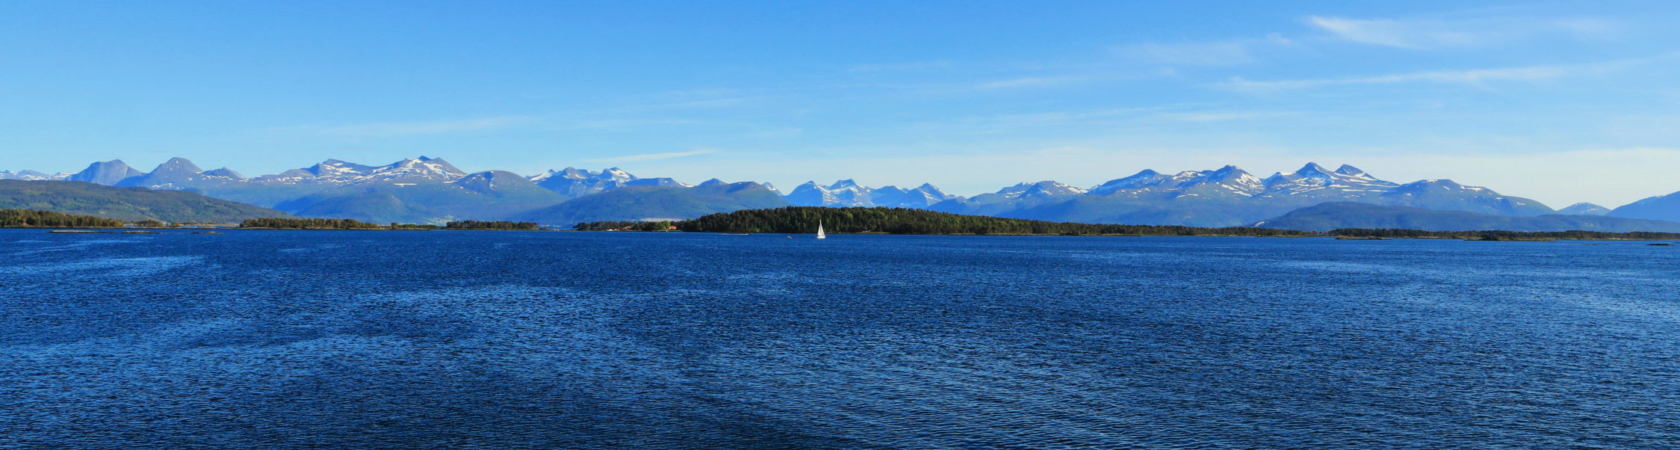 Molde Blick auf das bis 2000m hohe Romsdaler Gebirgsmassivs H.Reitz©2018